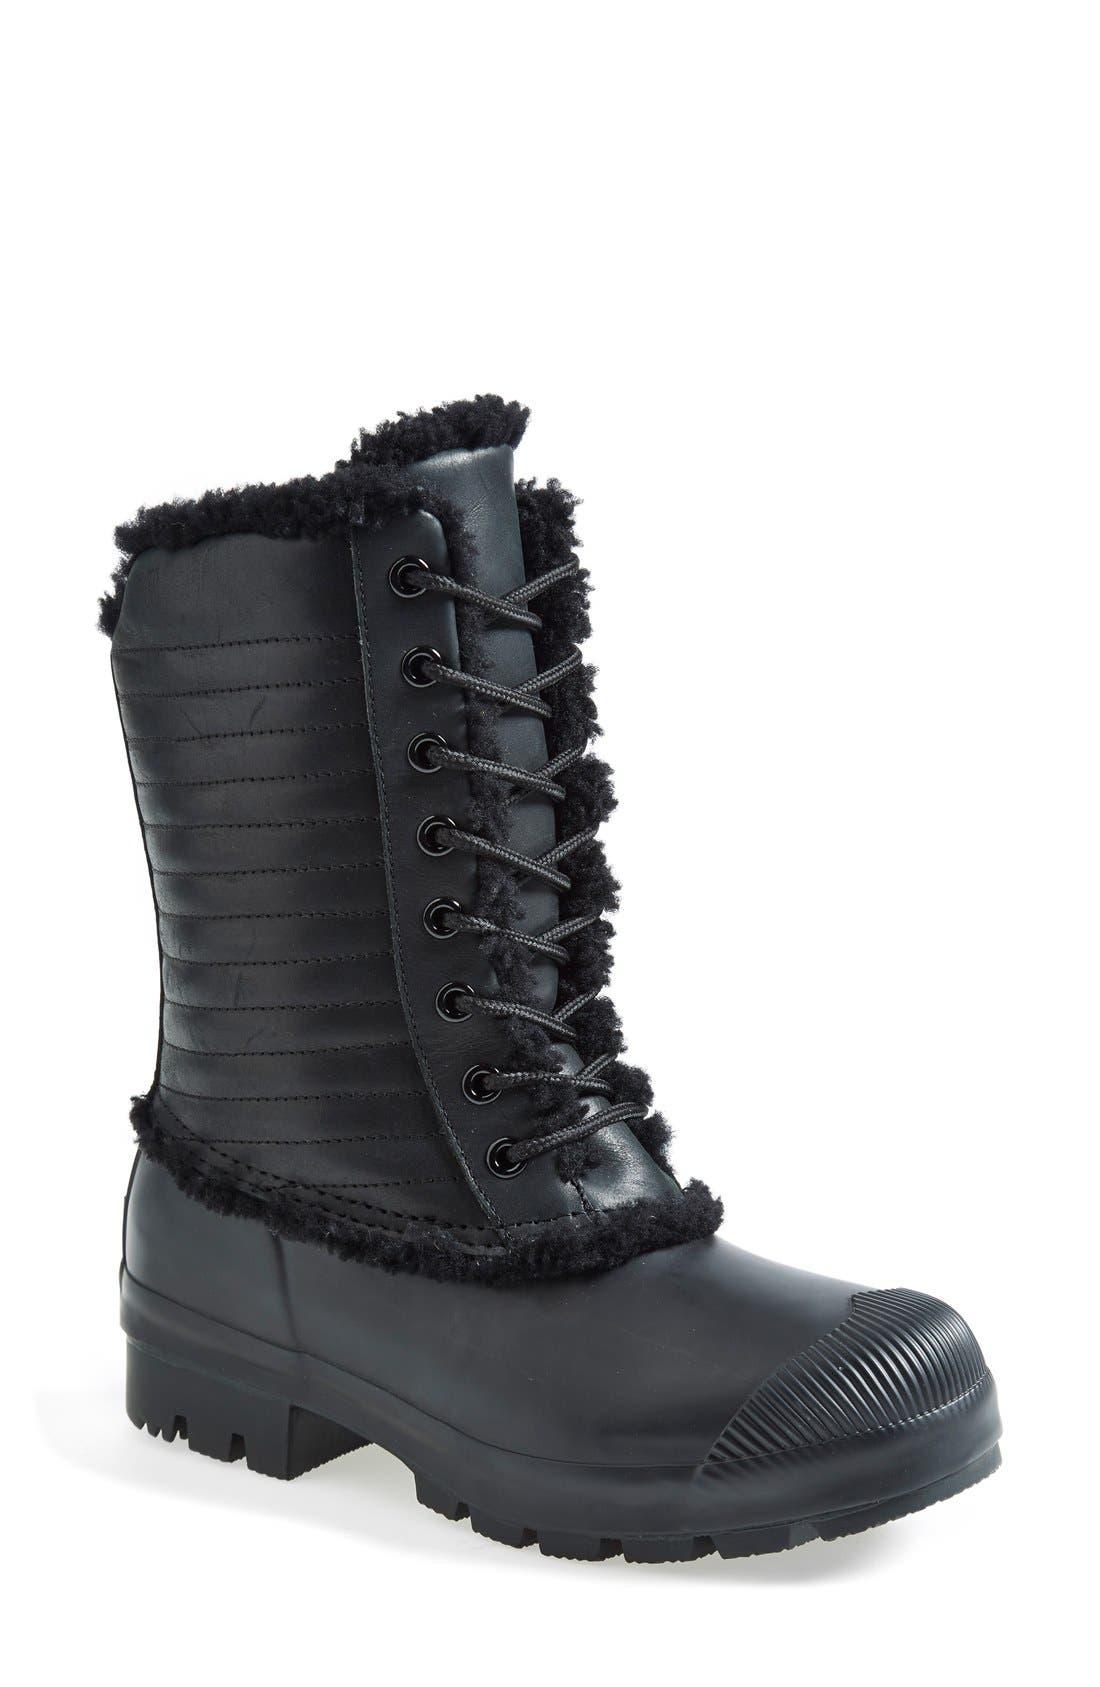 Main Image - Hunter Original Genuine Shearling & Patent Leather Lace-Up Rain Boot (Women)